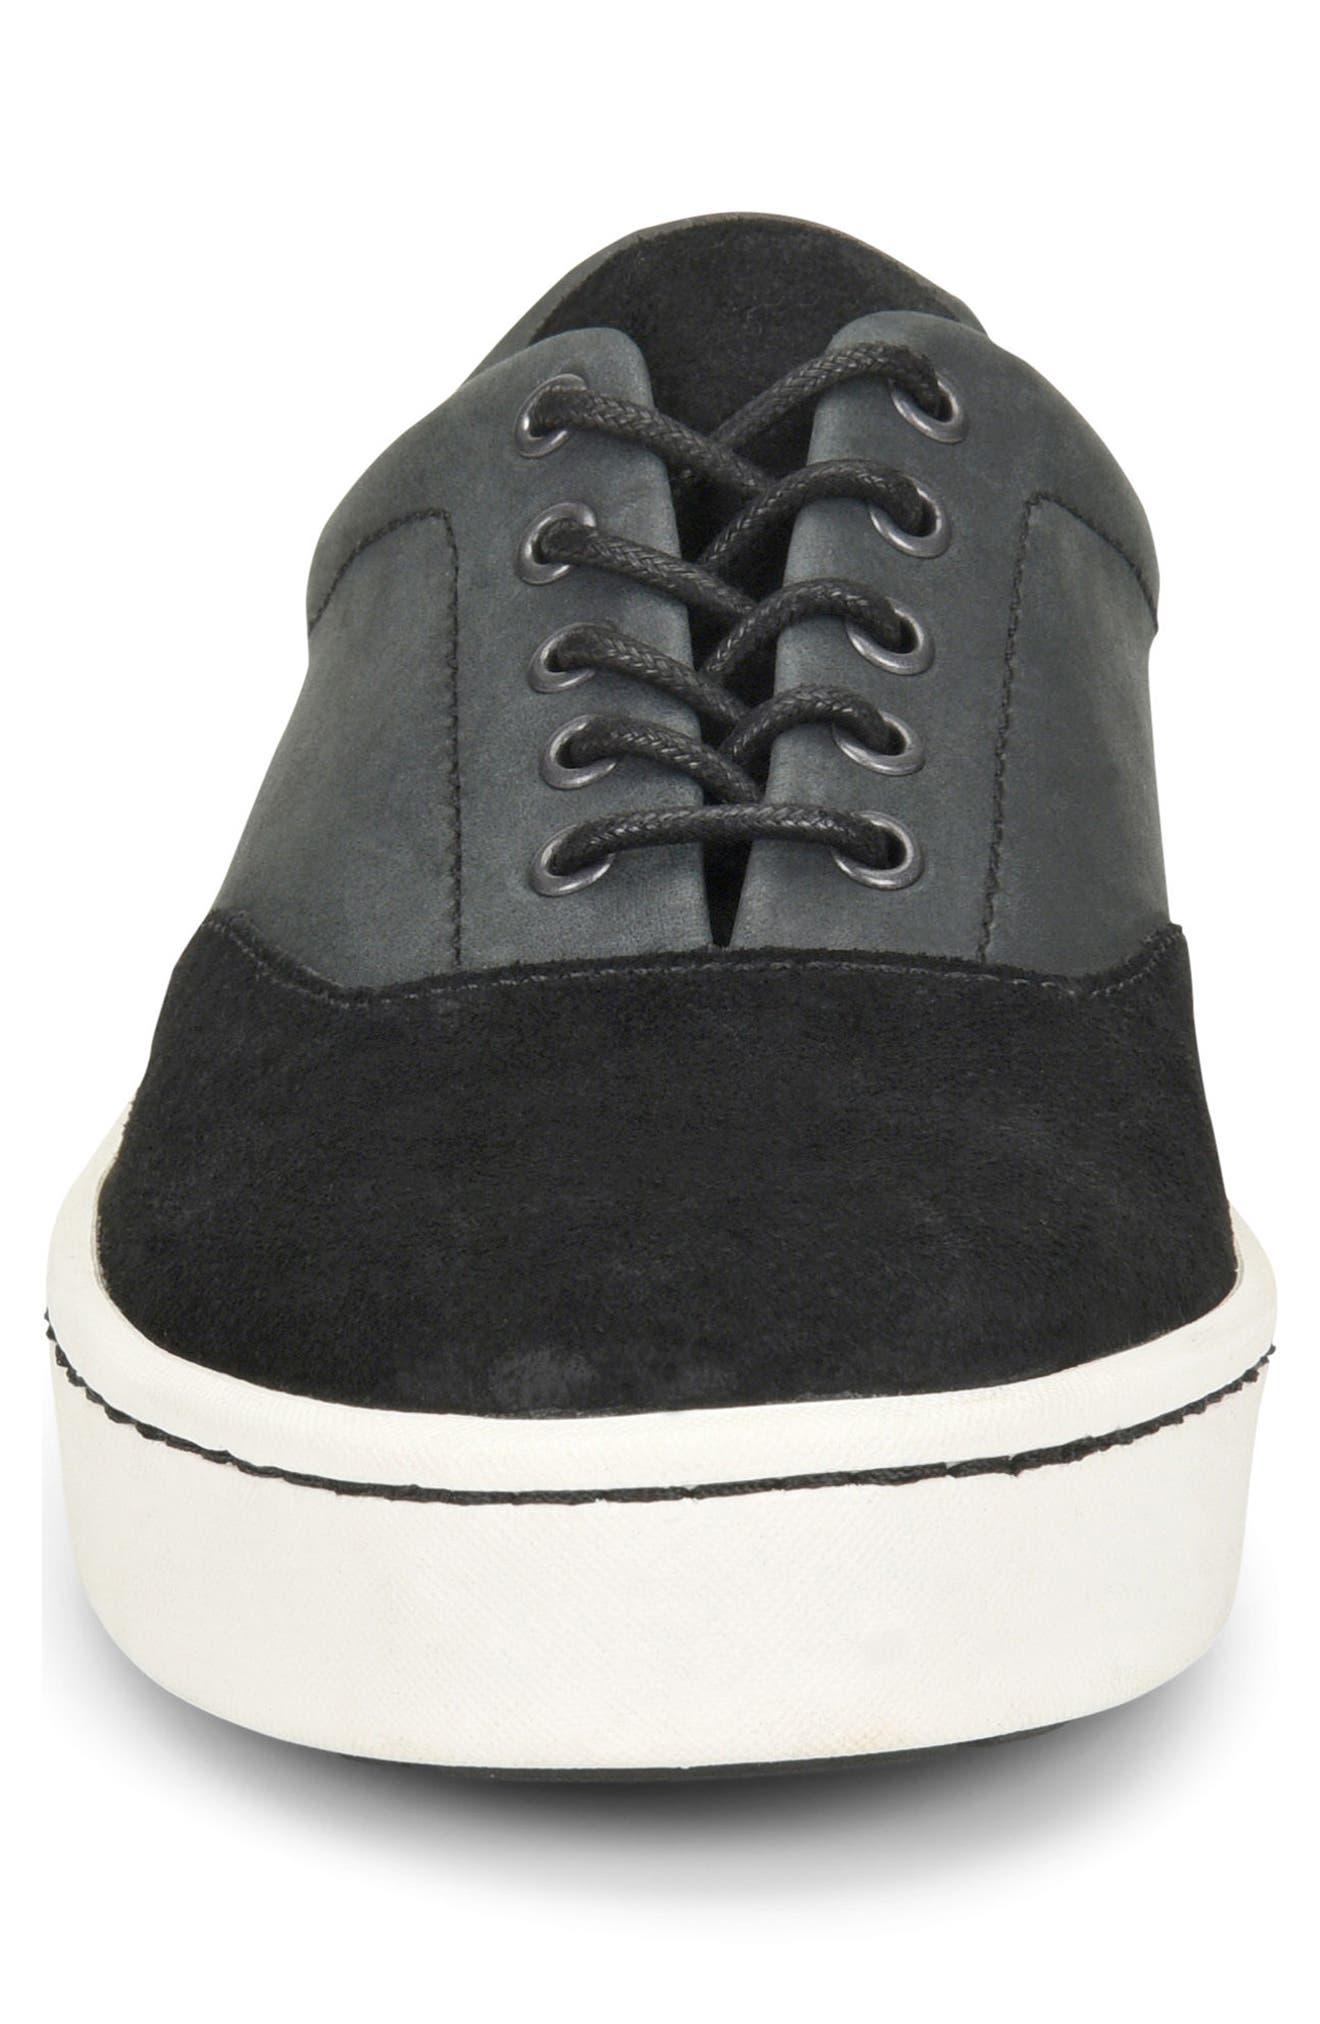 Keystone Low Top Sneaker,                             Alternate thumbnail 4, color,                             001